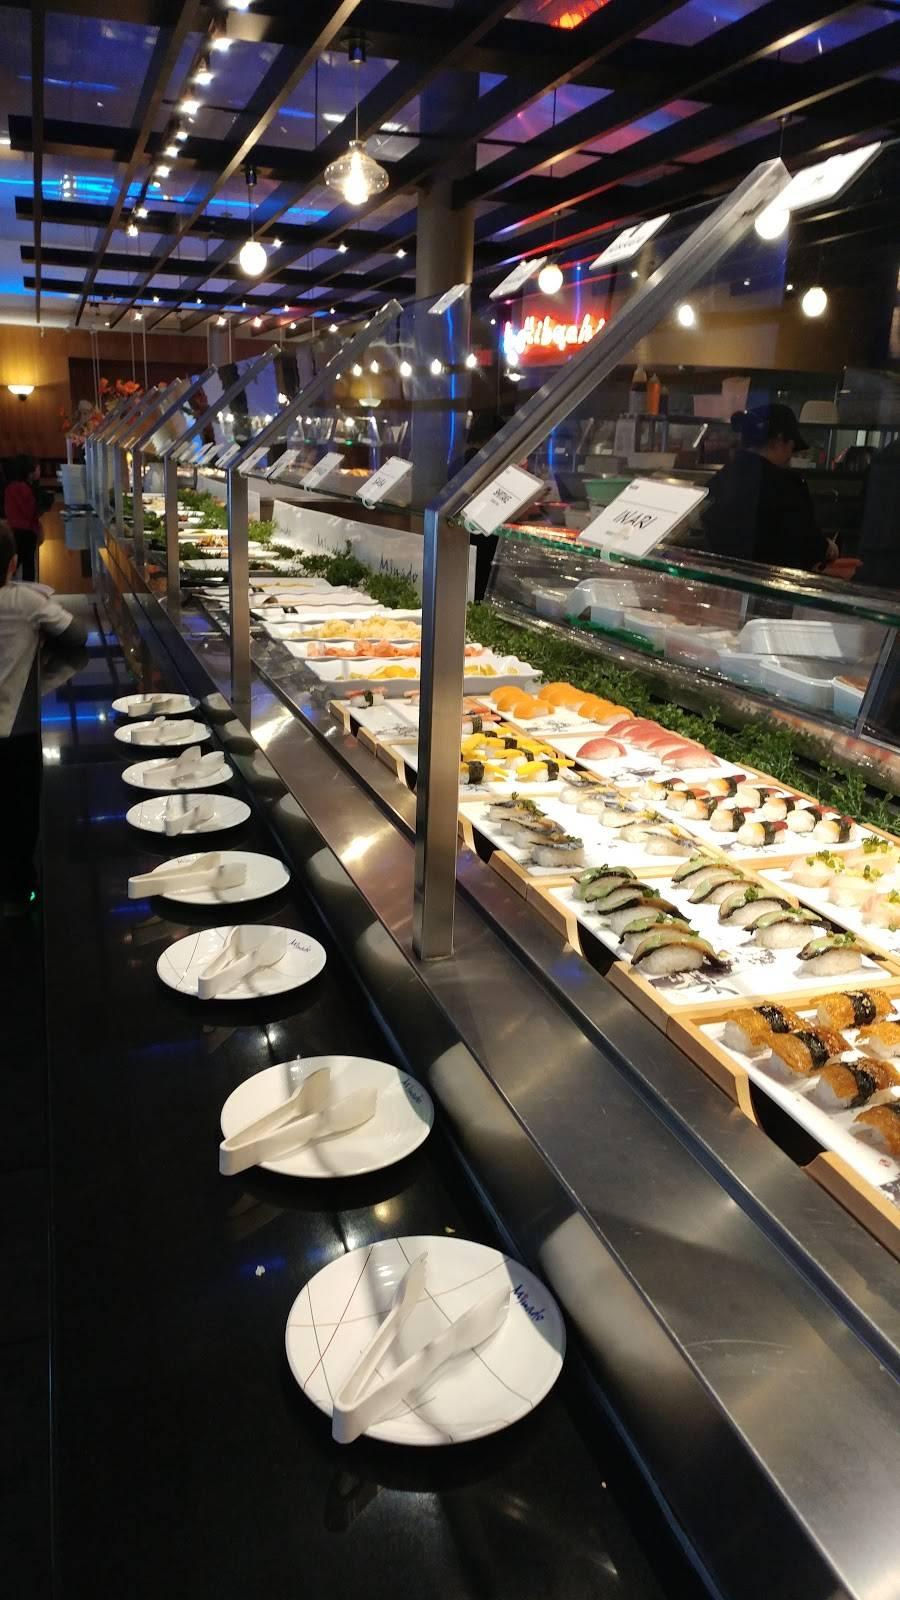 Minado Restaurant | restaurant | 2888 NJ-10, Morris Plains, NJ 07950, USA | 9737344900 OR +1 973-734-4900